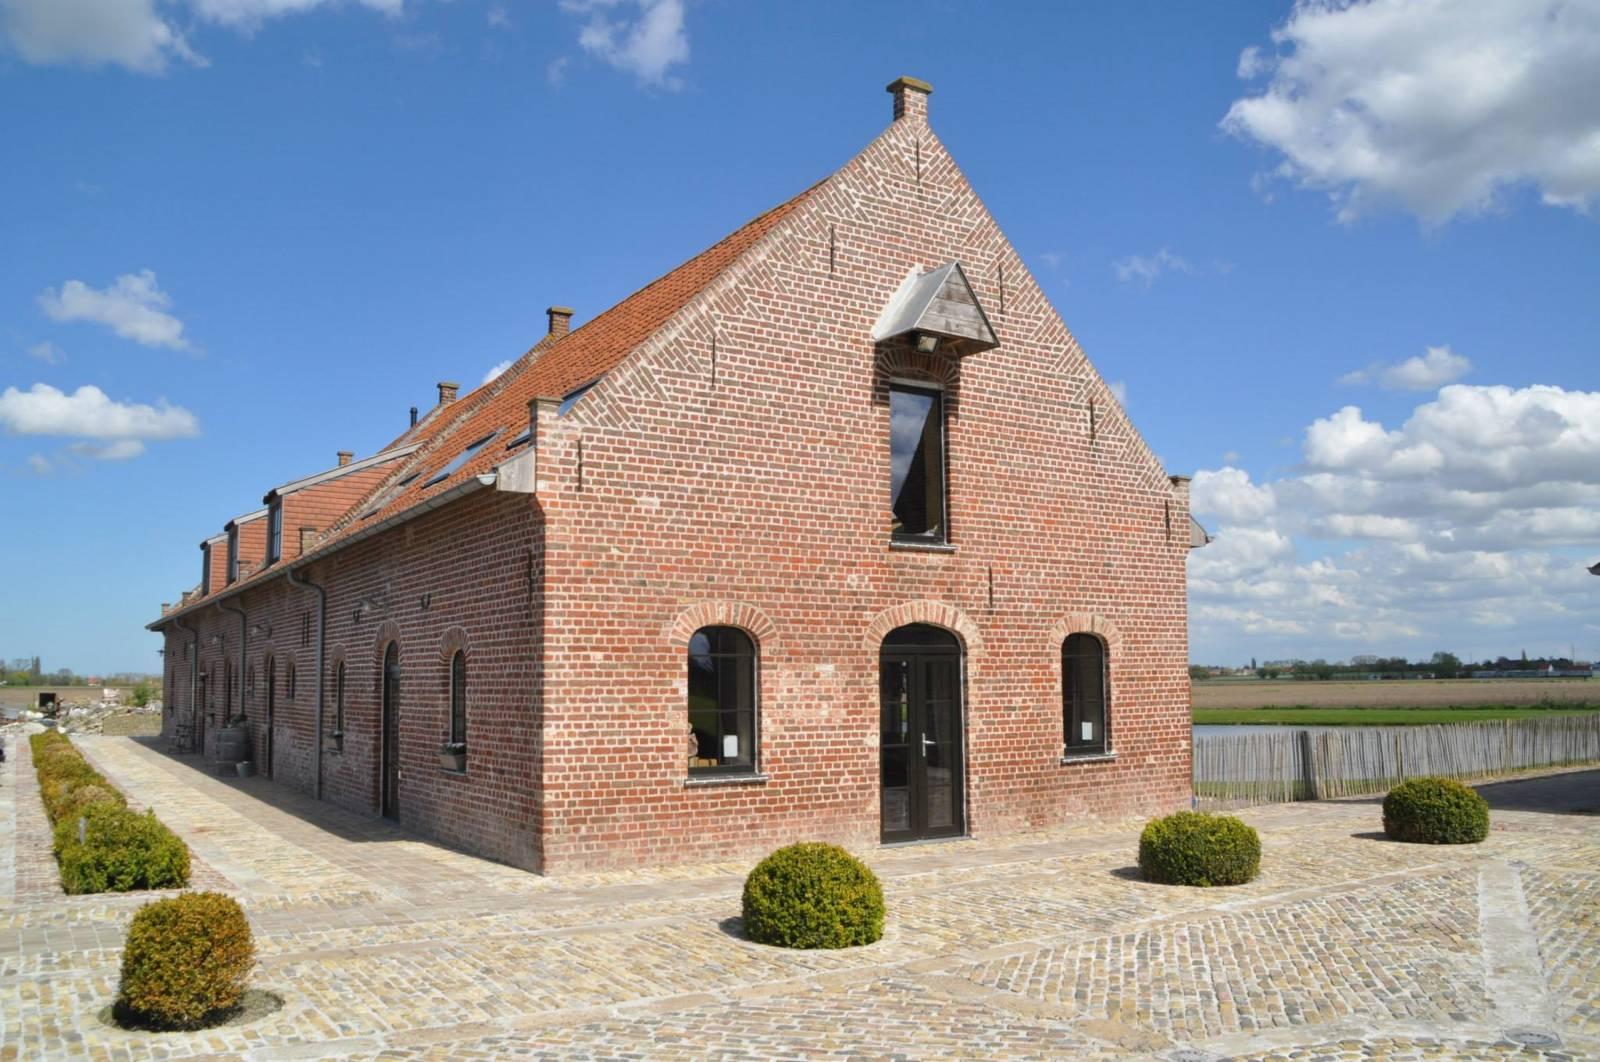 House of Weddings Domein t Eikennest Feestzaal Catering ceremonie West Vlaanderen slaapkamers (6)